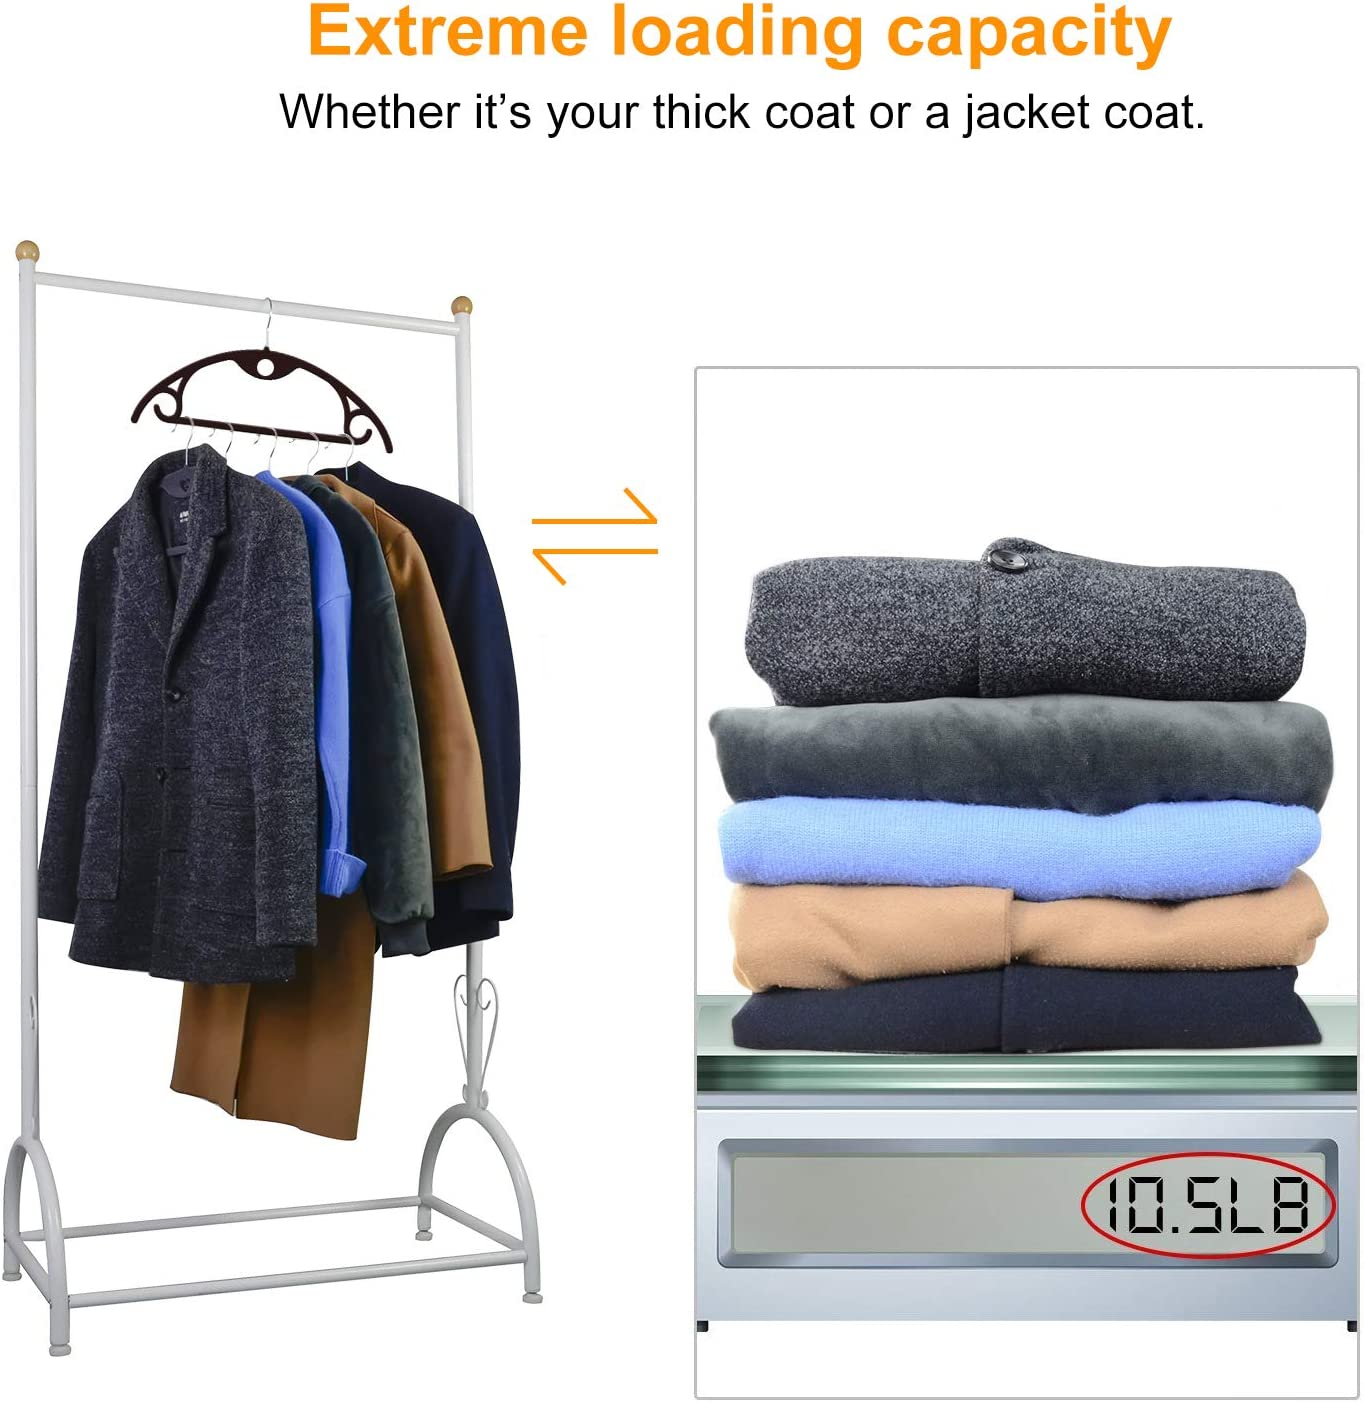 Ultra Thin Space Saving with Heavy Duty 360 Swivel Chrome Hook Non-Slip Suit Clothes Hangers Coat Hangers Brown 50-Pack IEOKE Premium Velvet Hangers